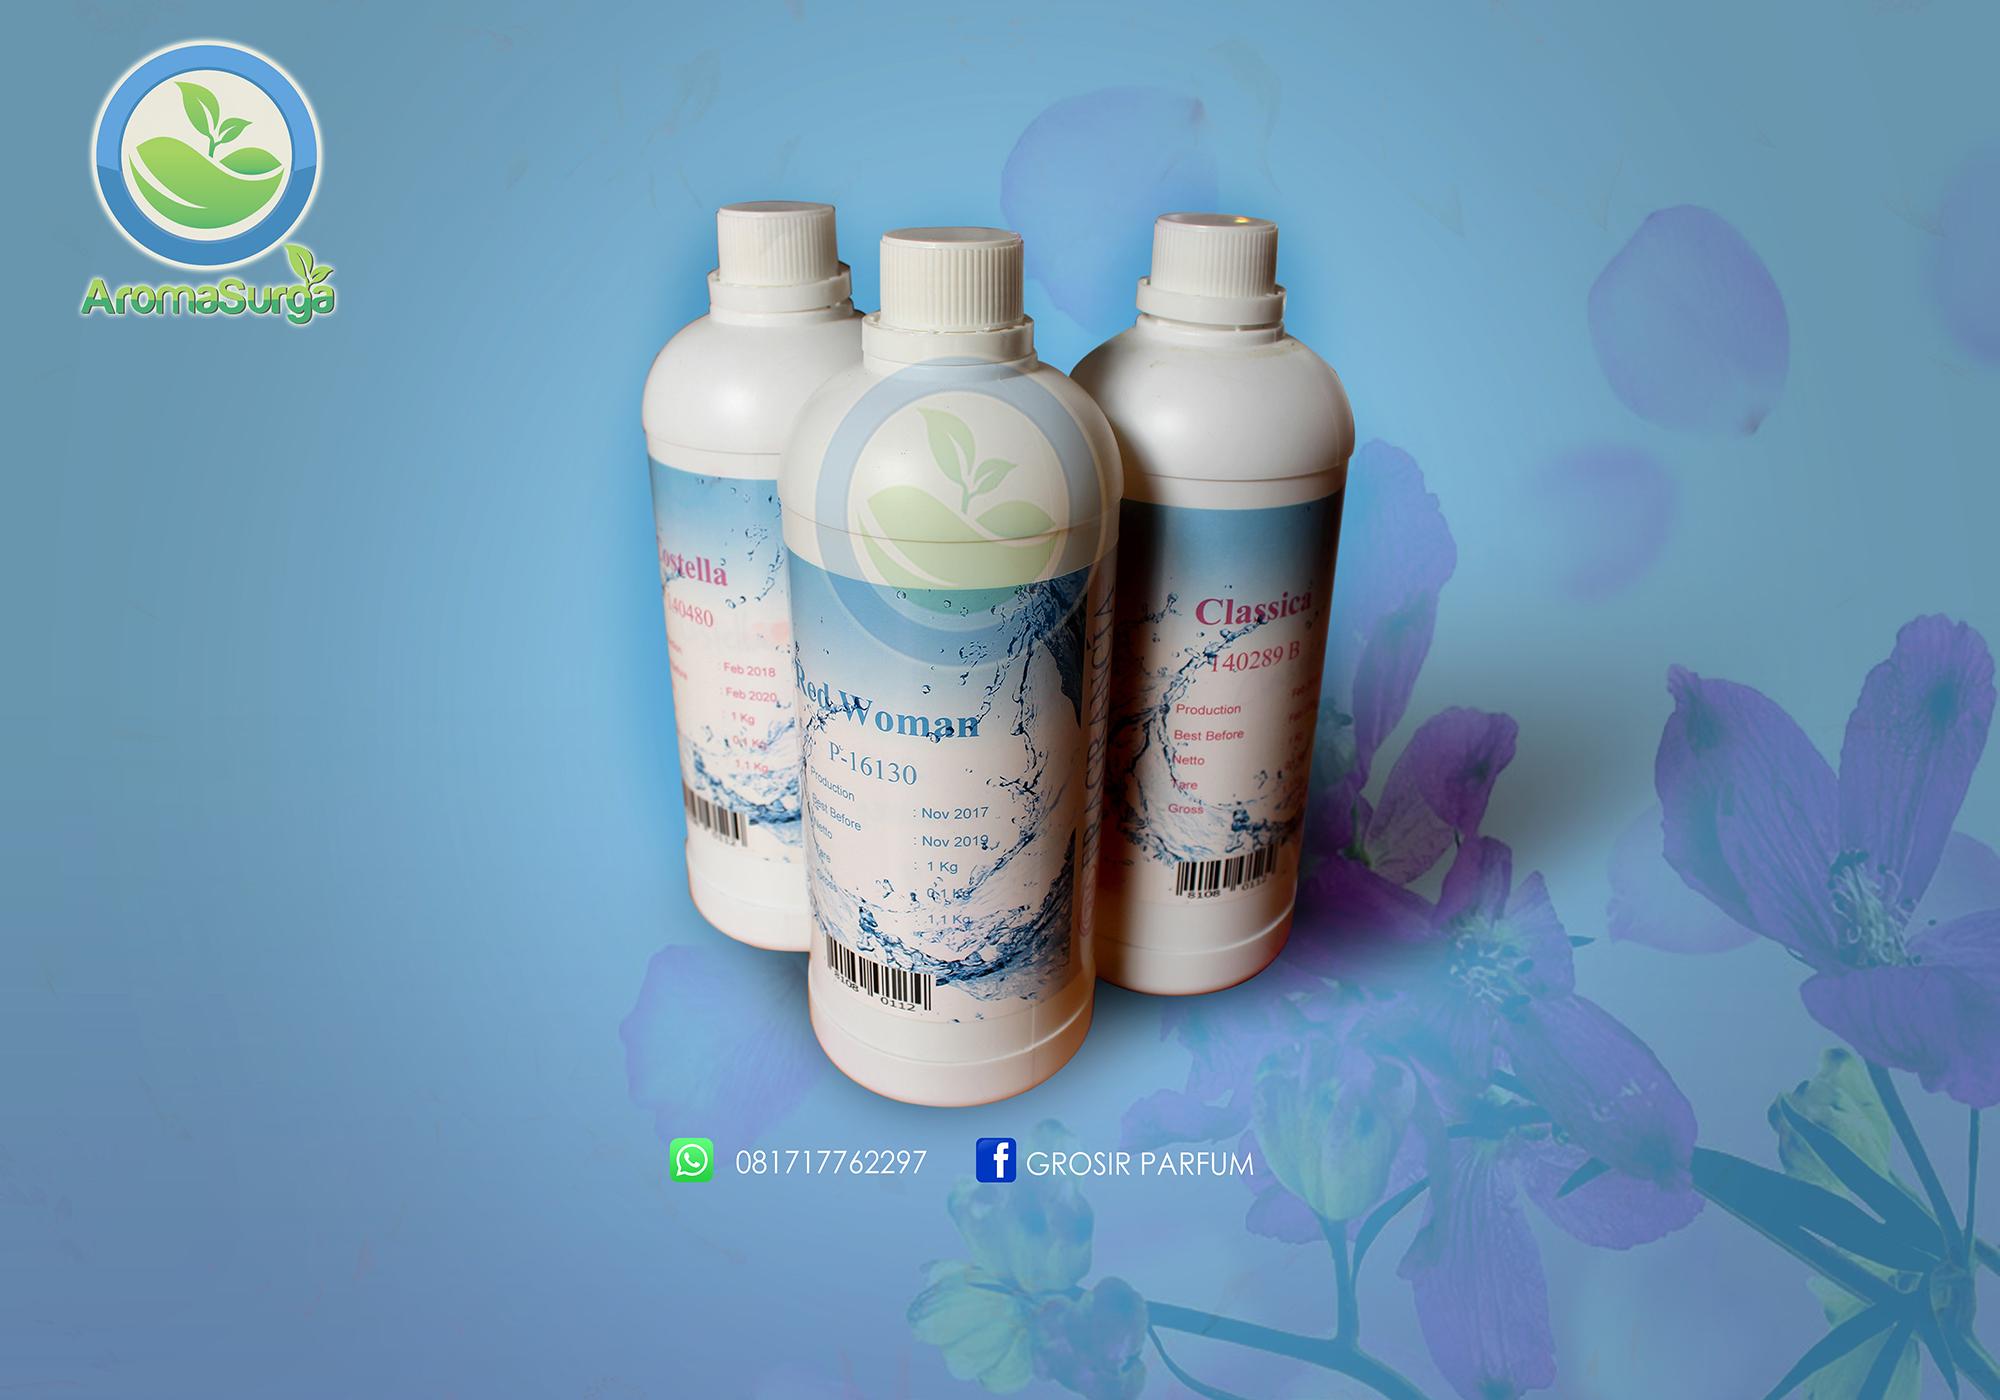 Grosir Parfum Surabaya, Bibit Parfum Cremer